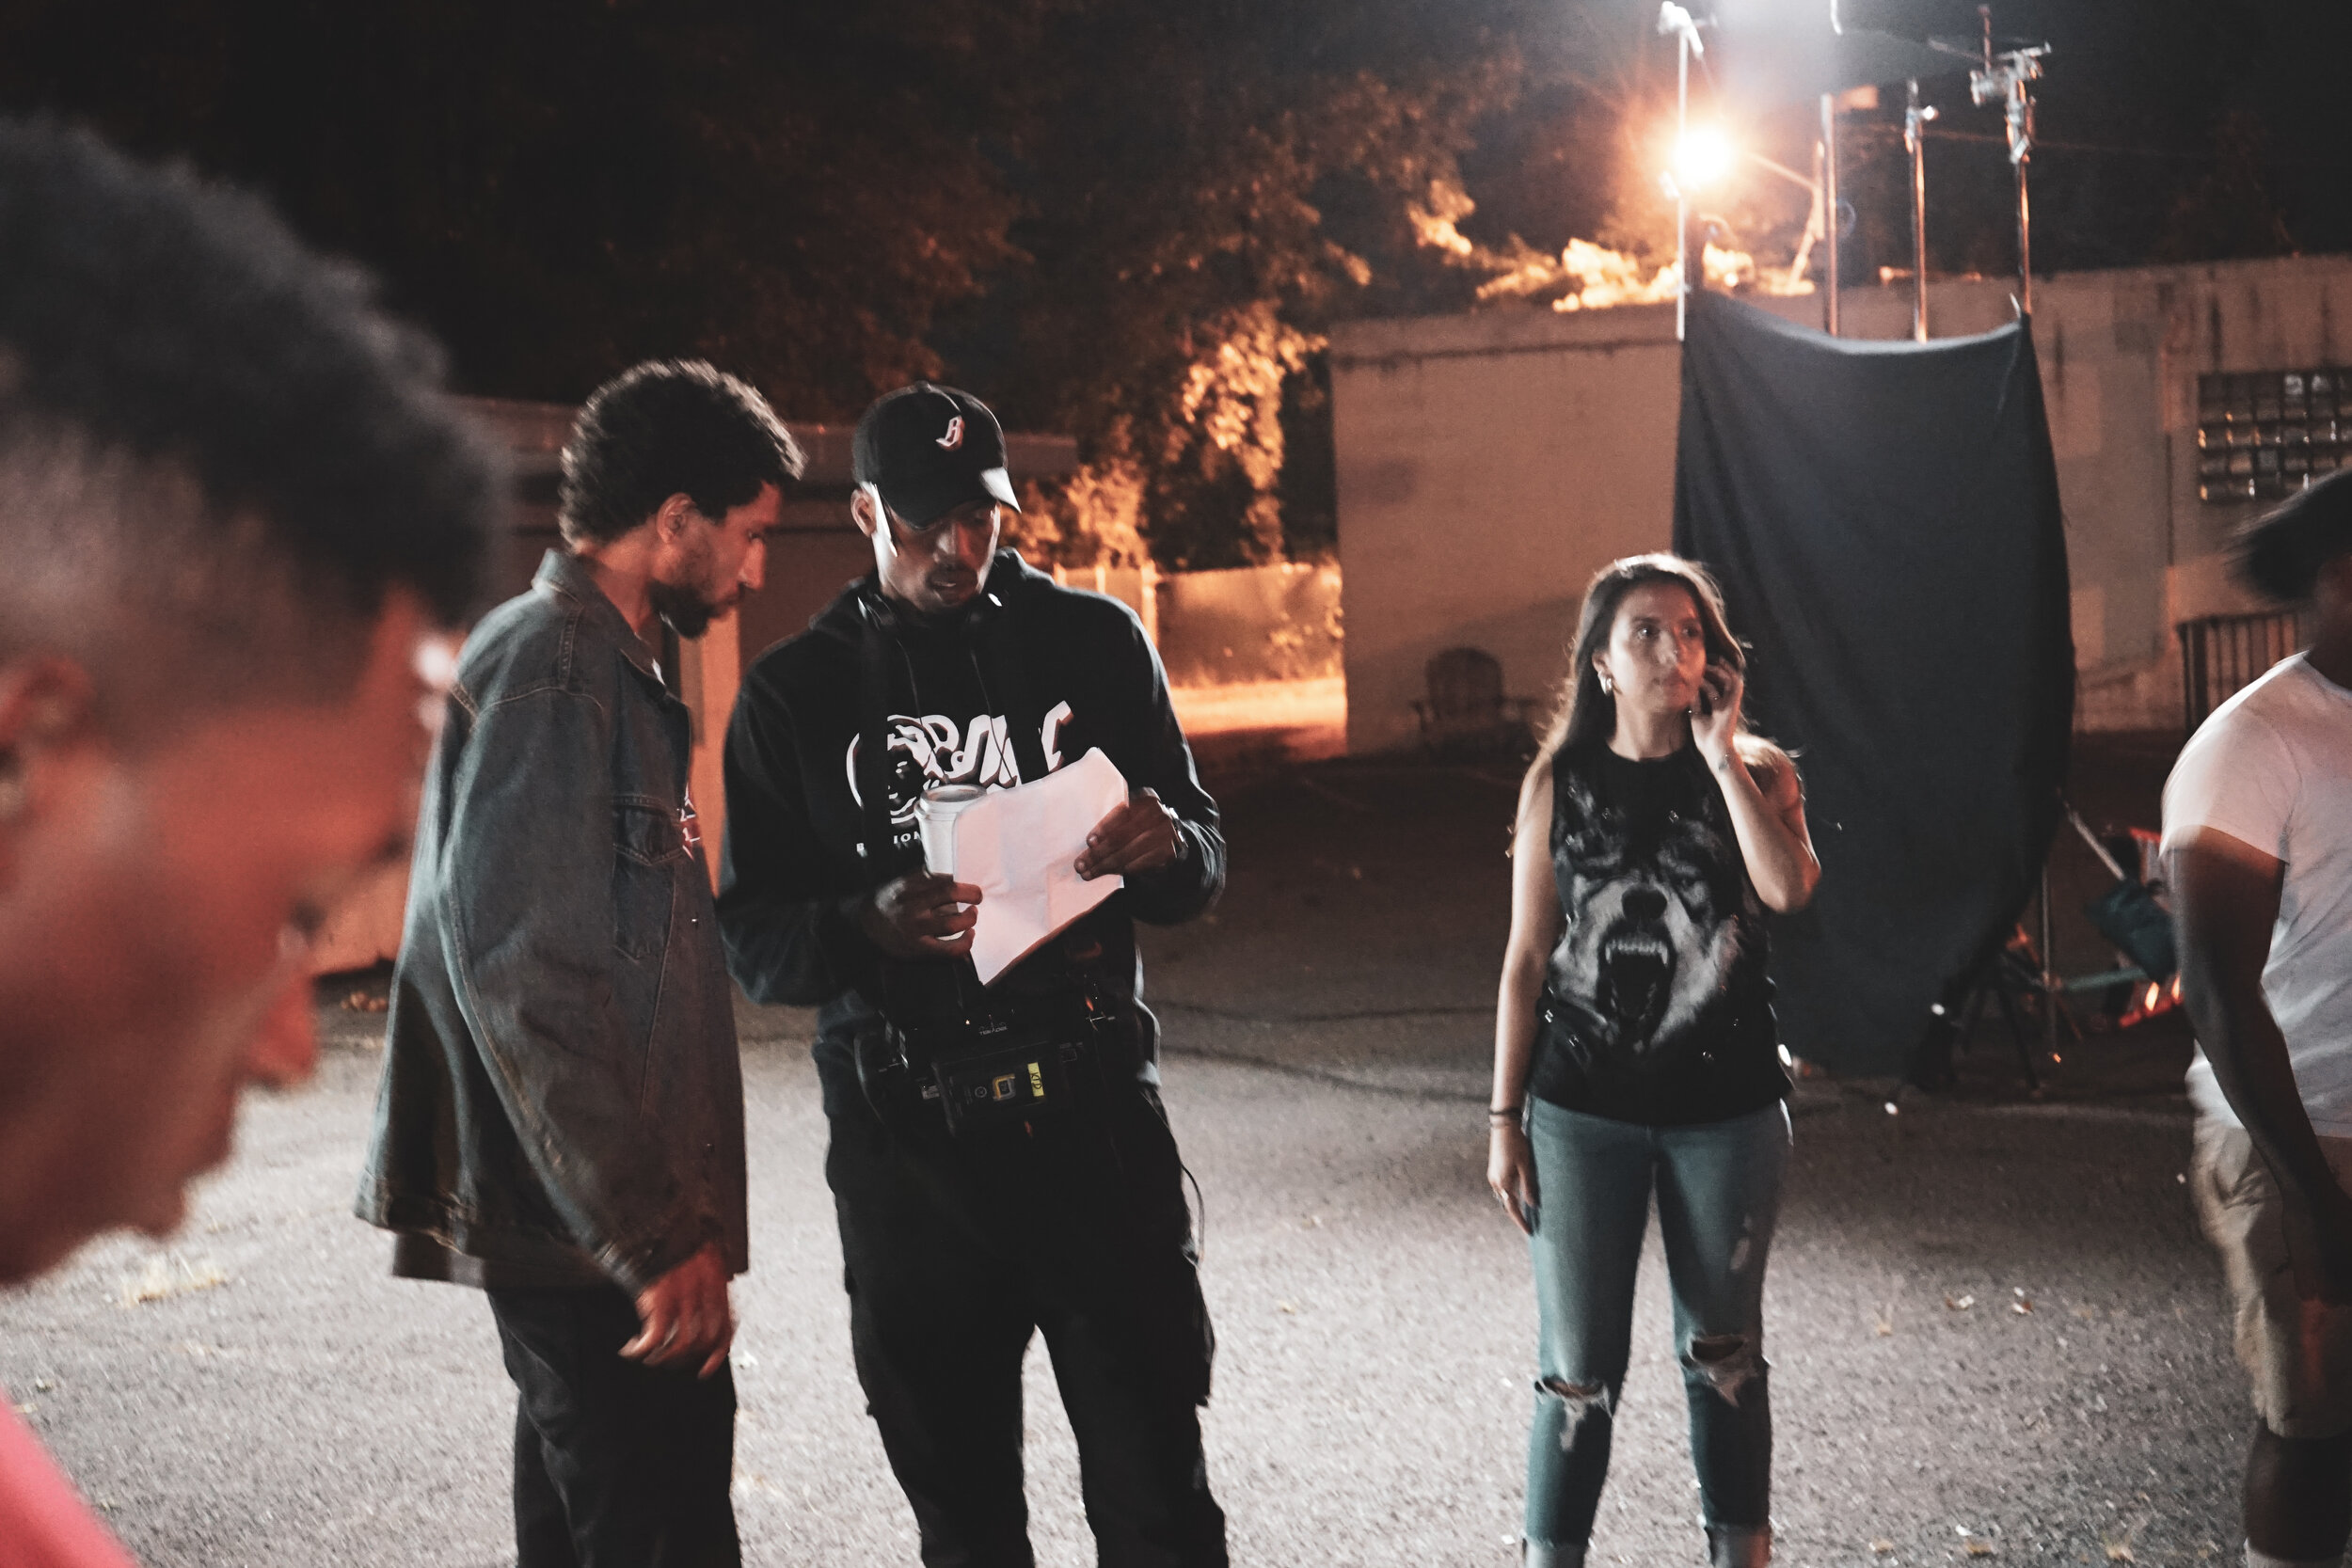 Clout - short film from Campsight Studios